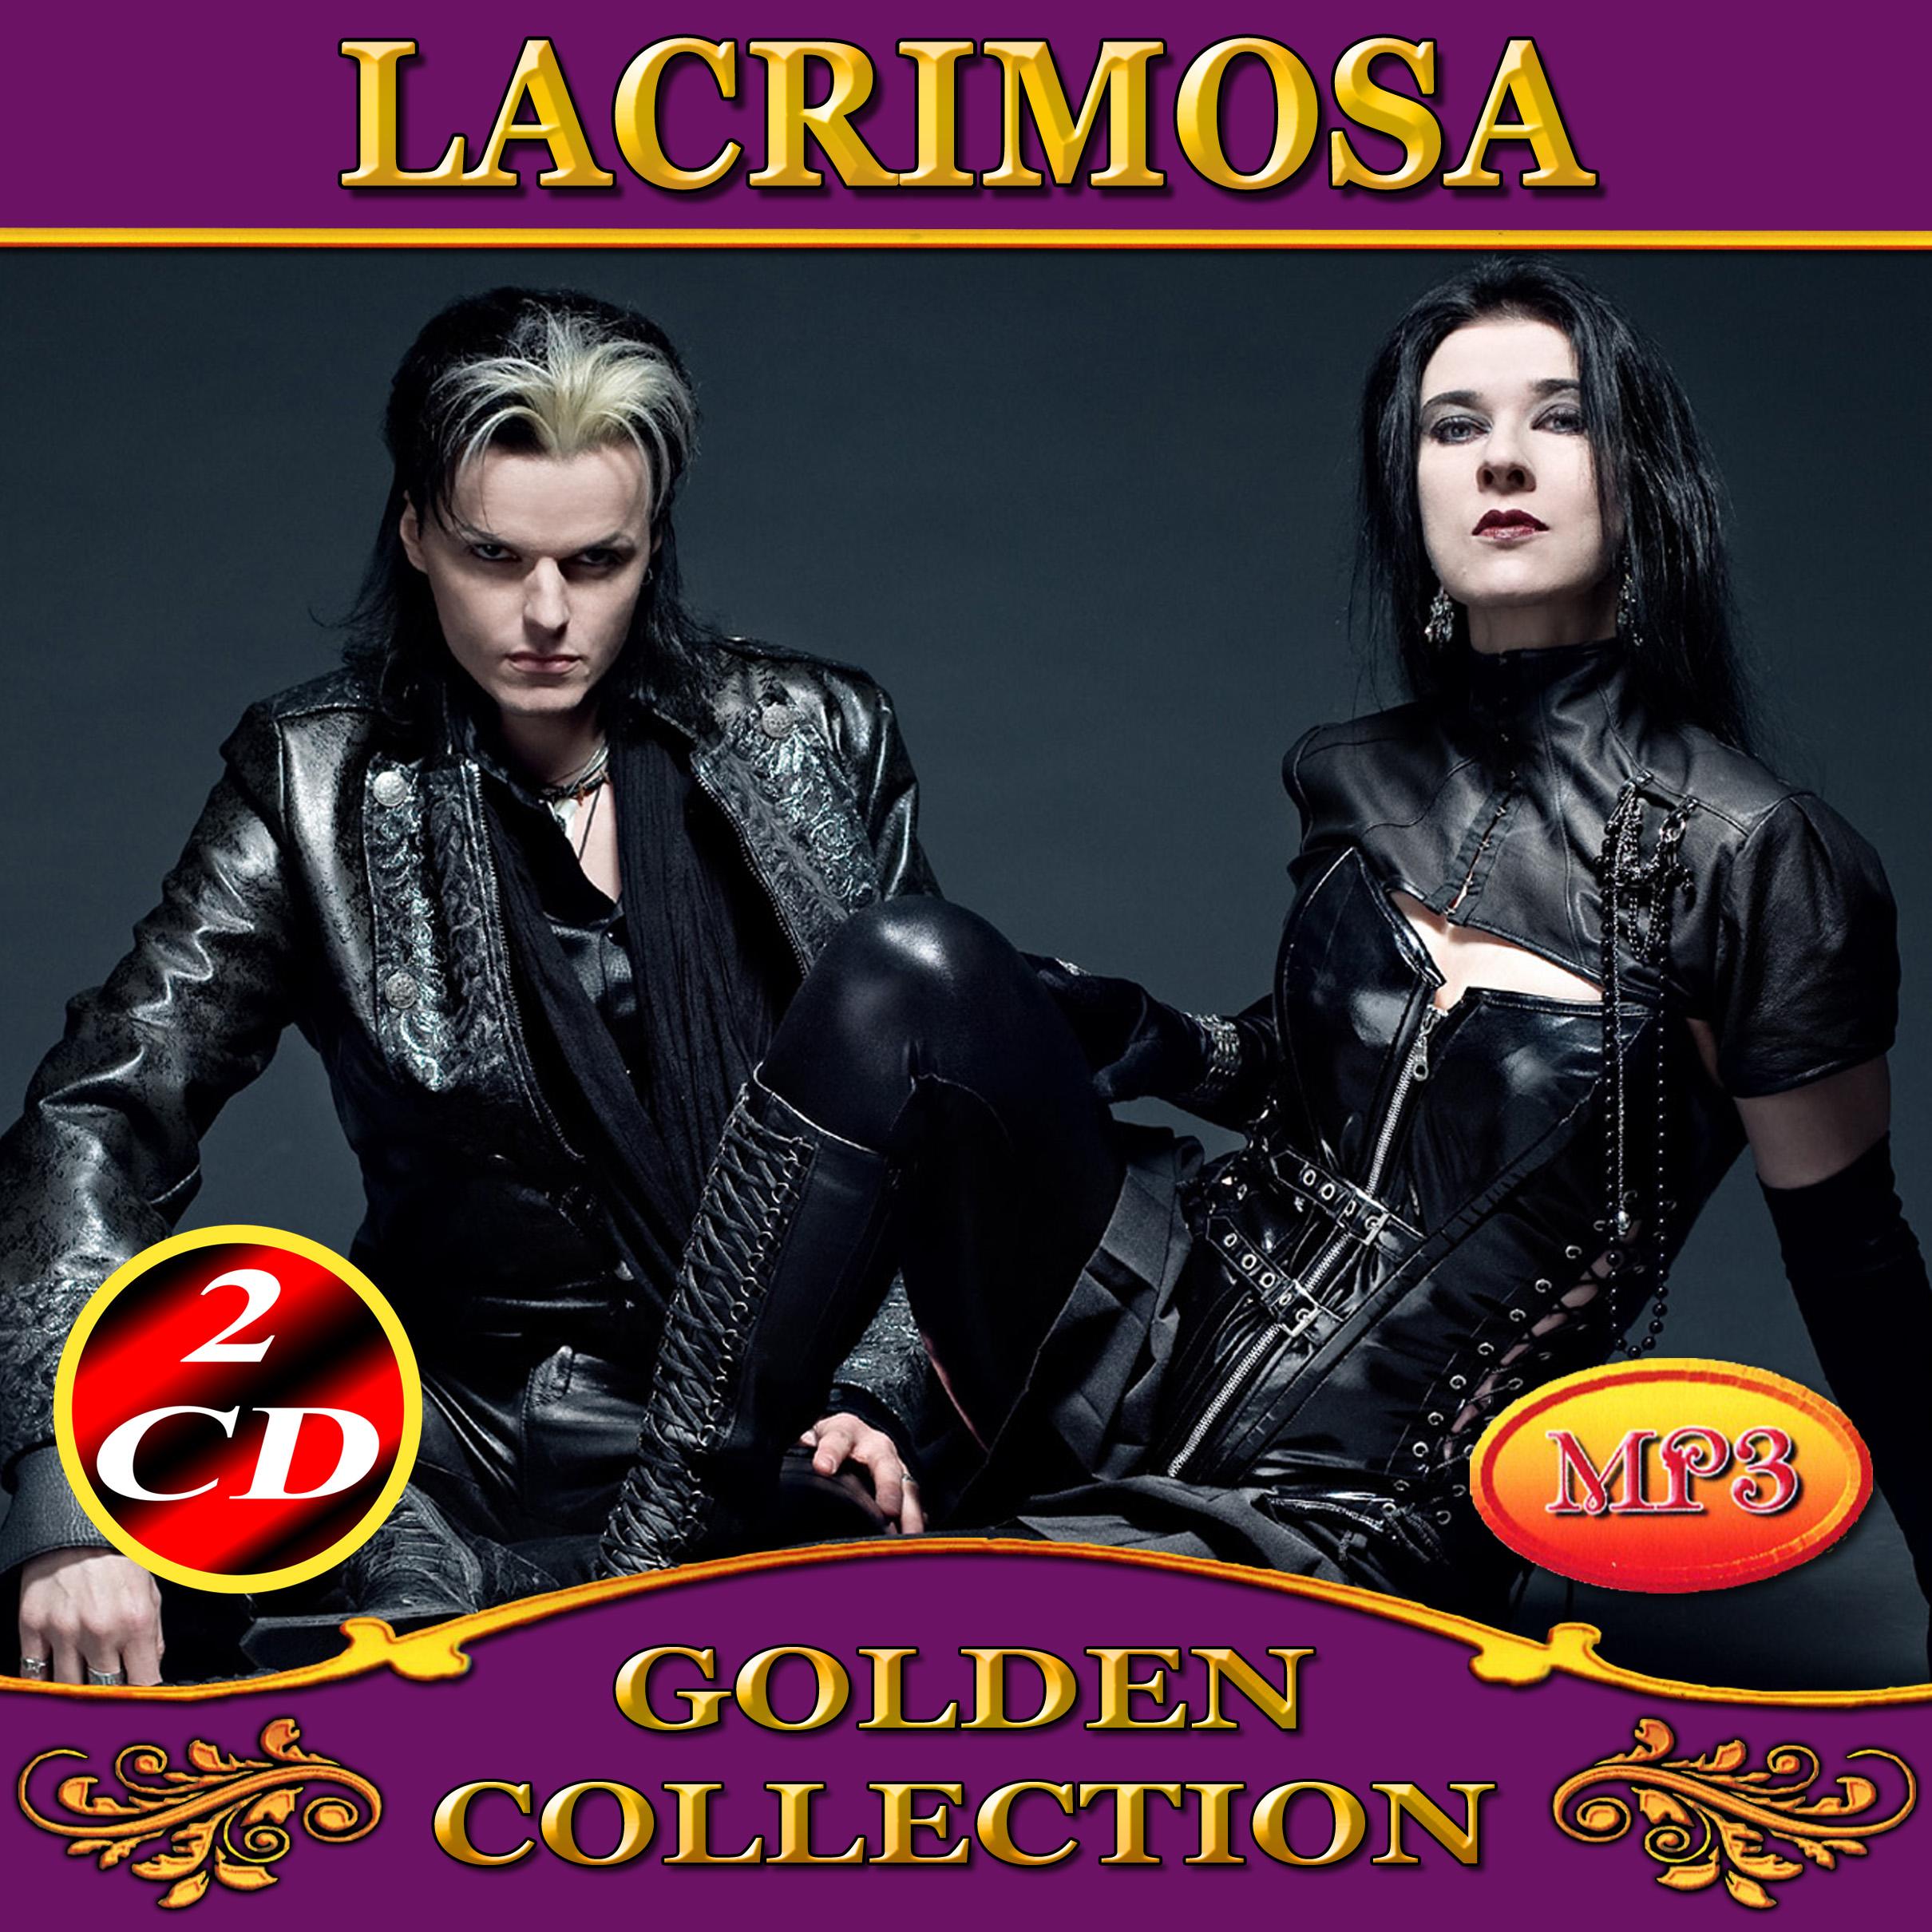 Lacrimosa 2cd [mp3]